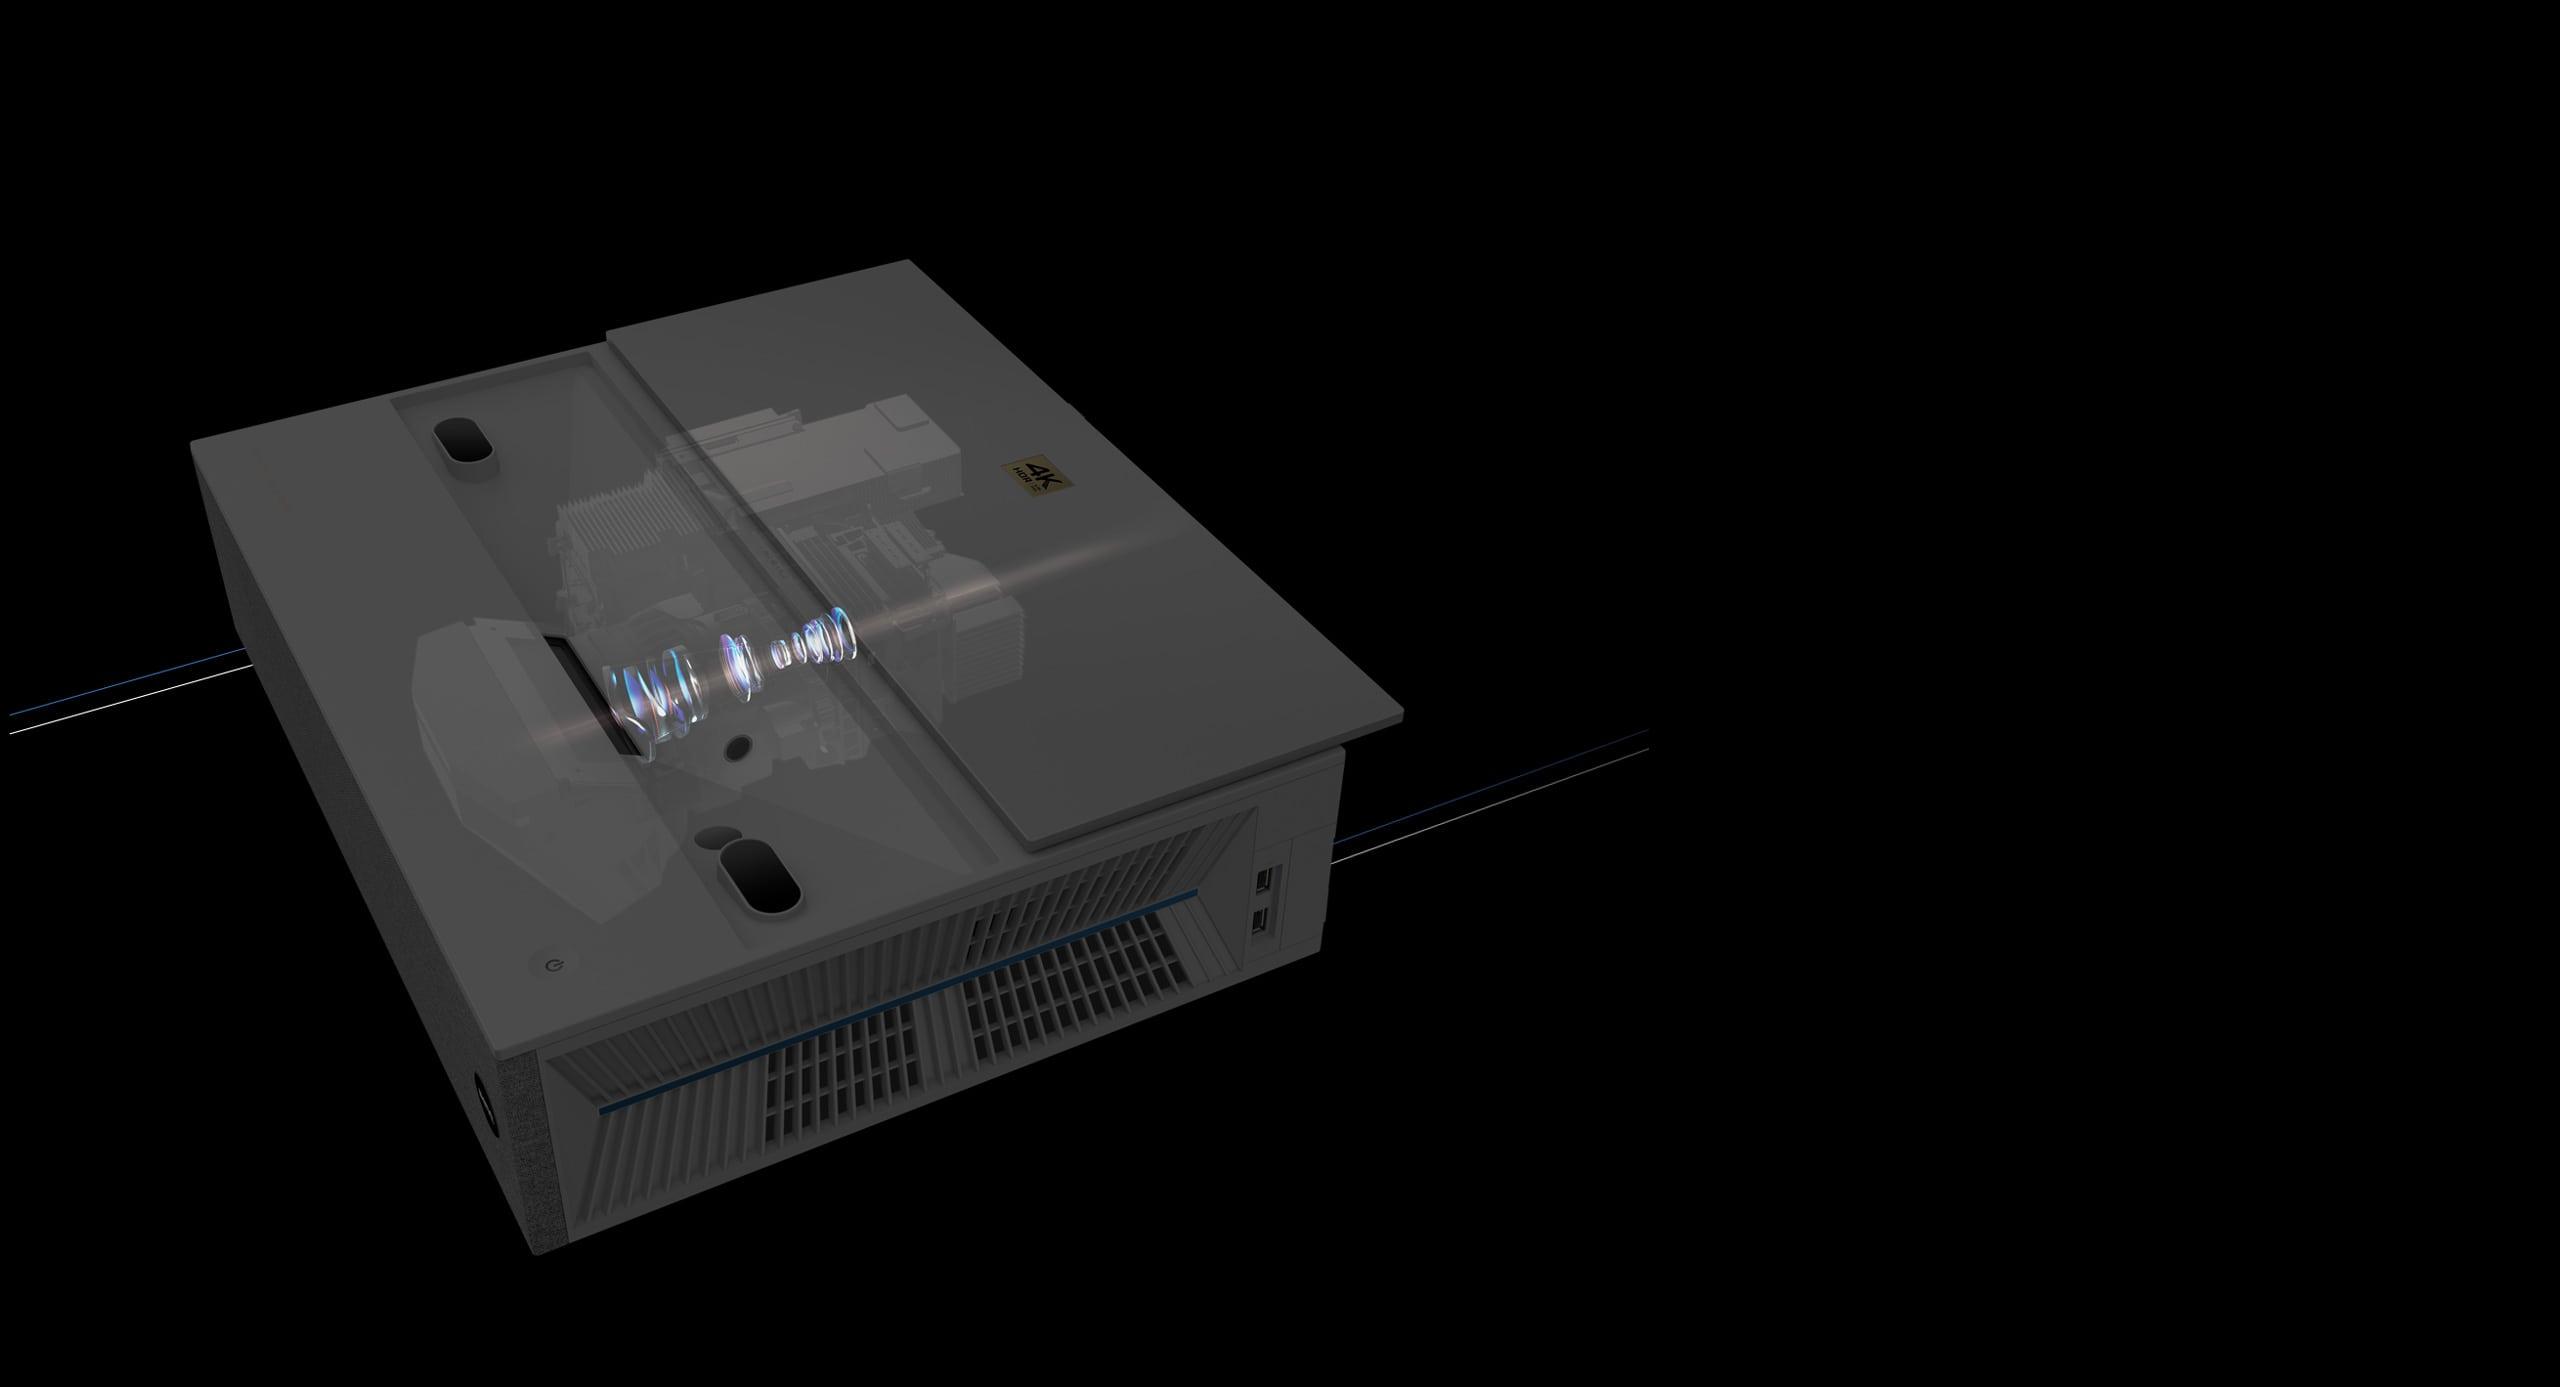 projector-v6000-18glass-lens-w-min.jpg